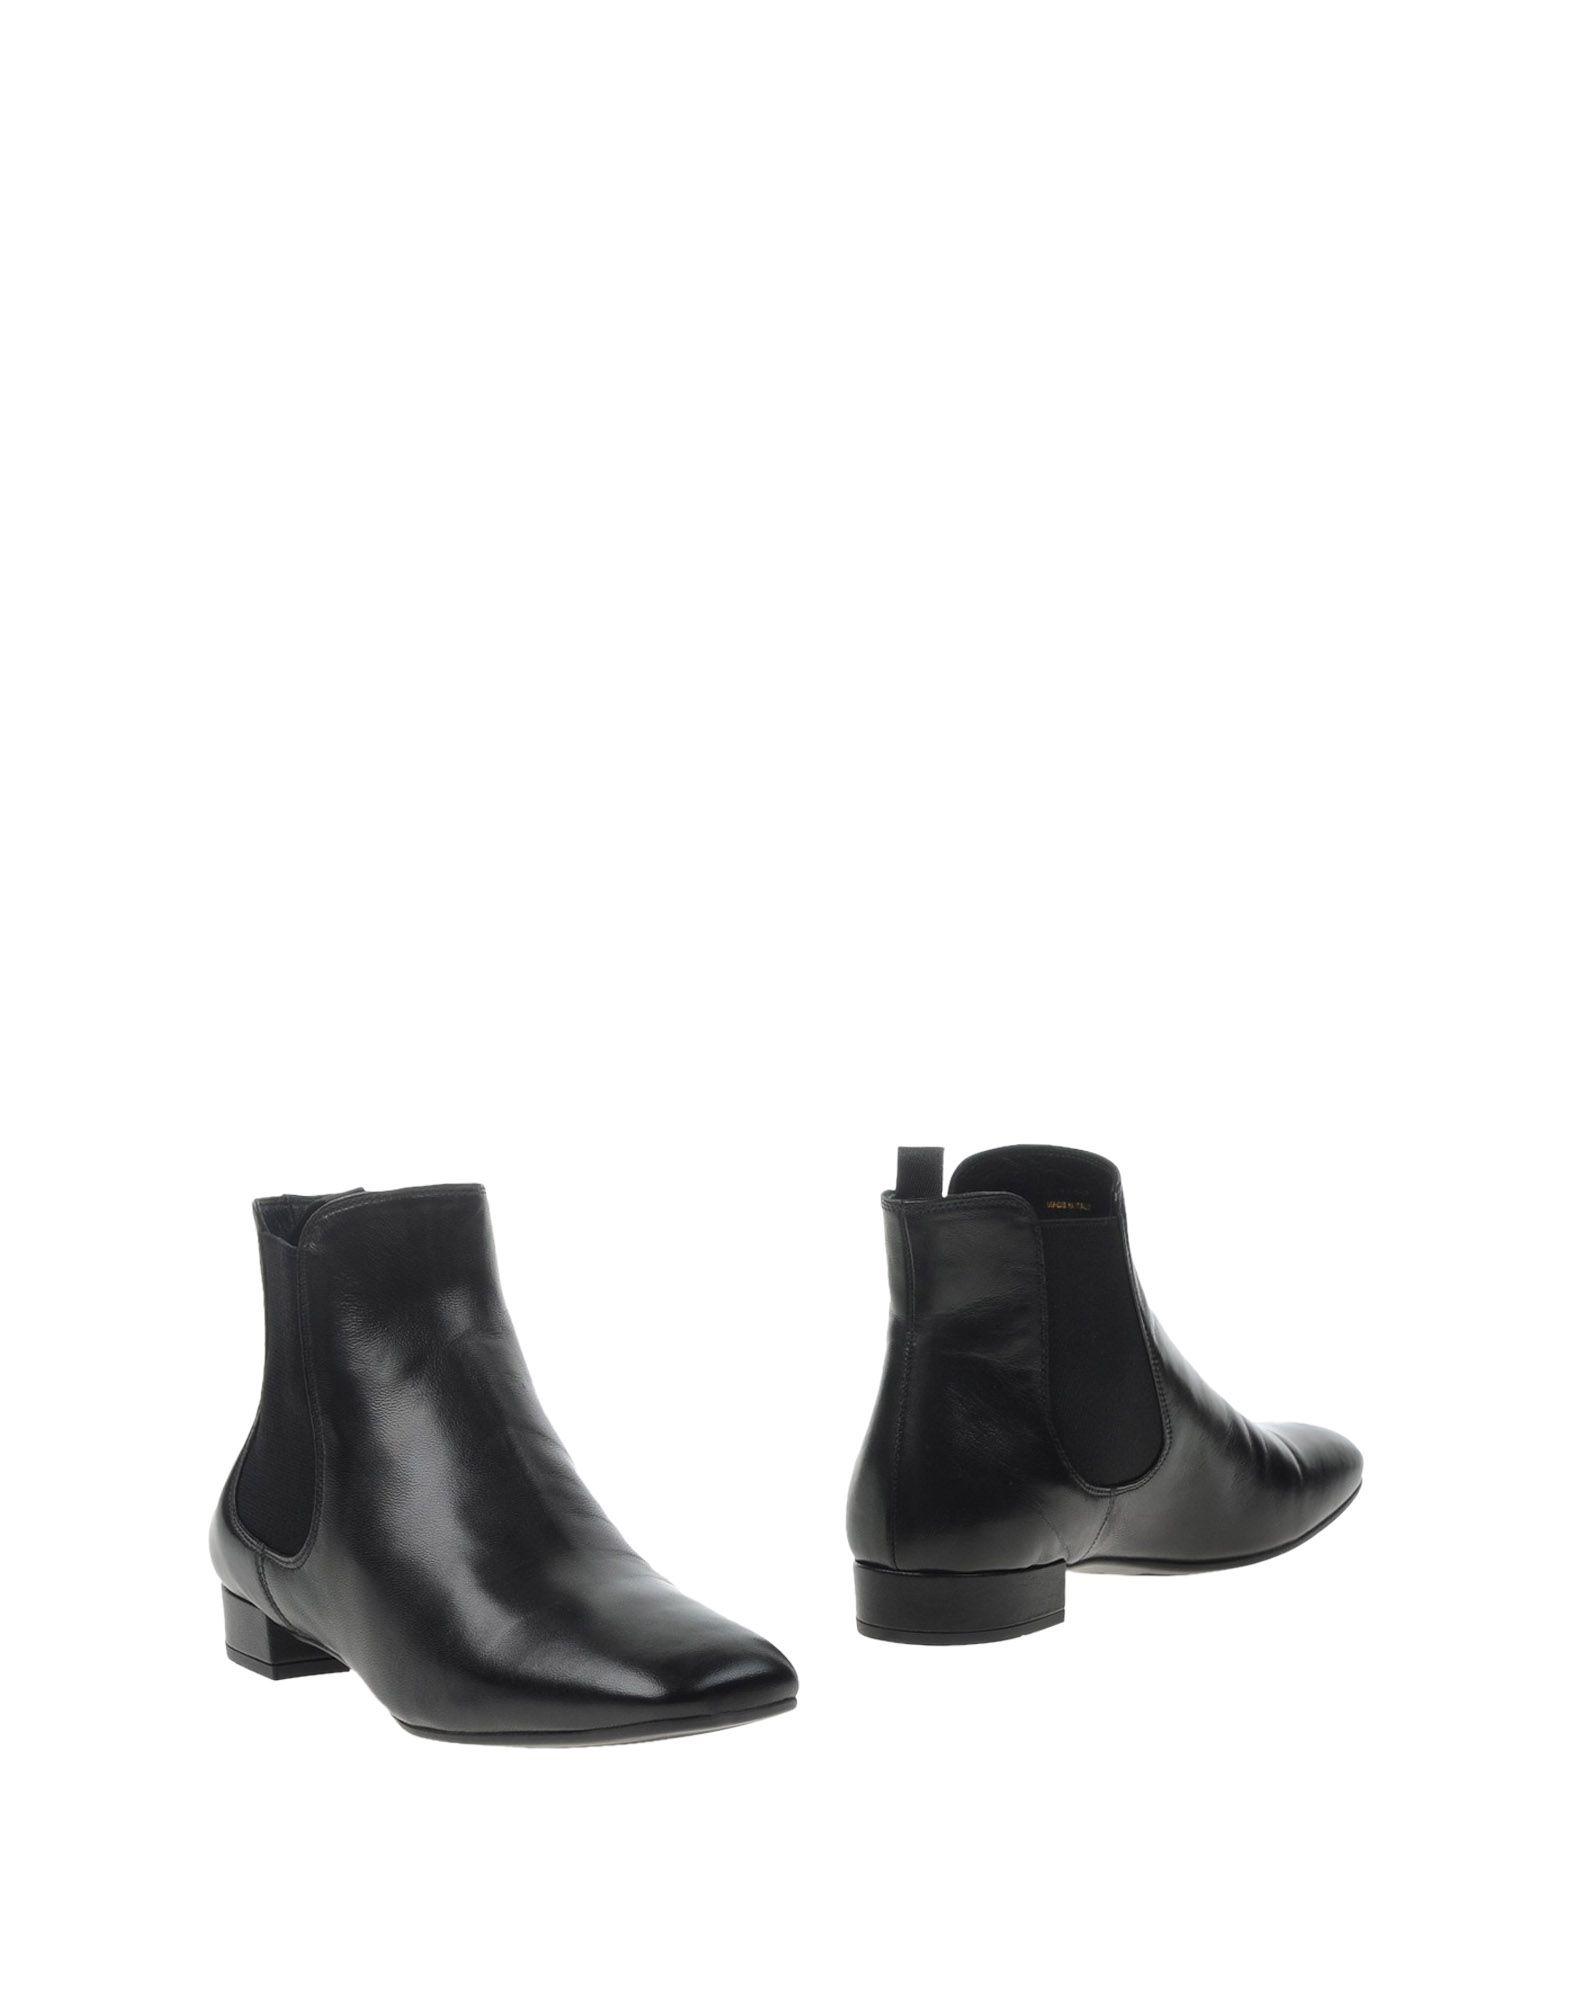 Prada Ankle Boot - Women Prada Ankle Boots online on 11069607LL  United Kingdom - 11069607LL on 8c9fb8